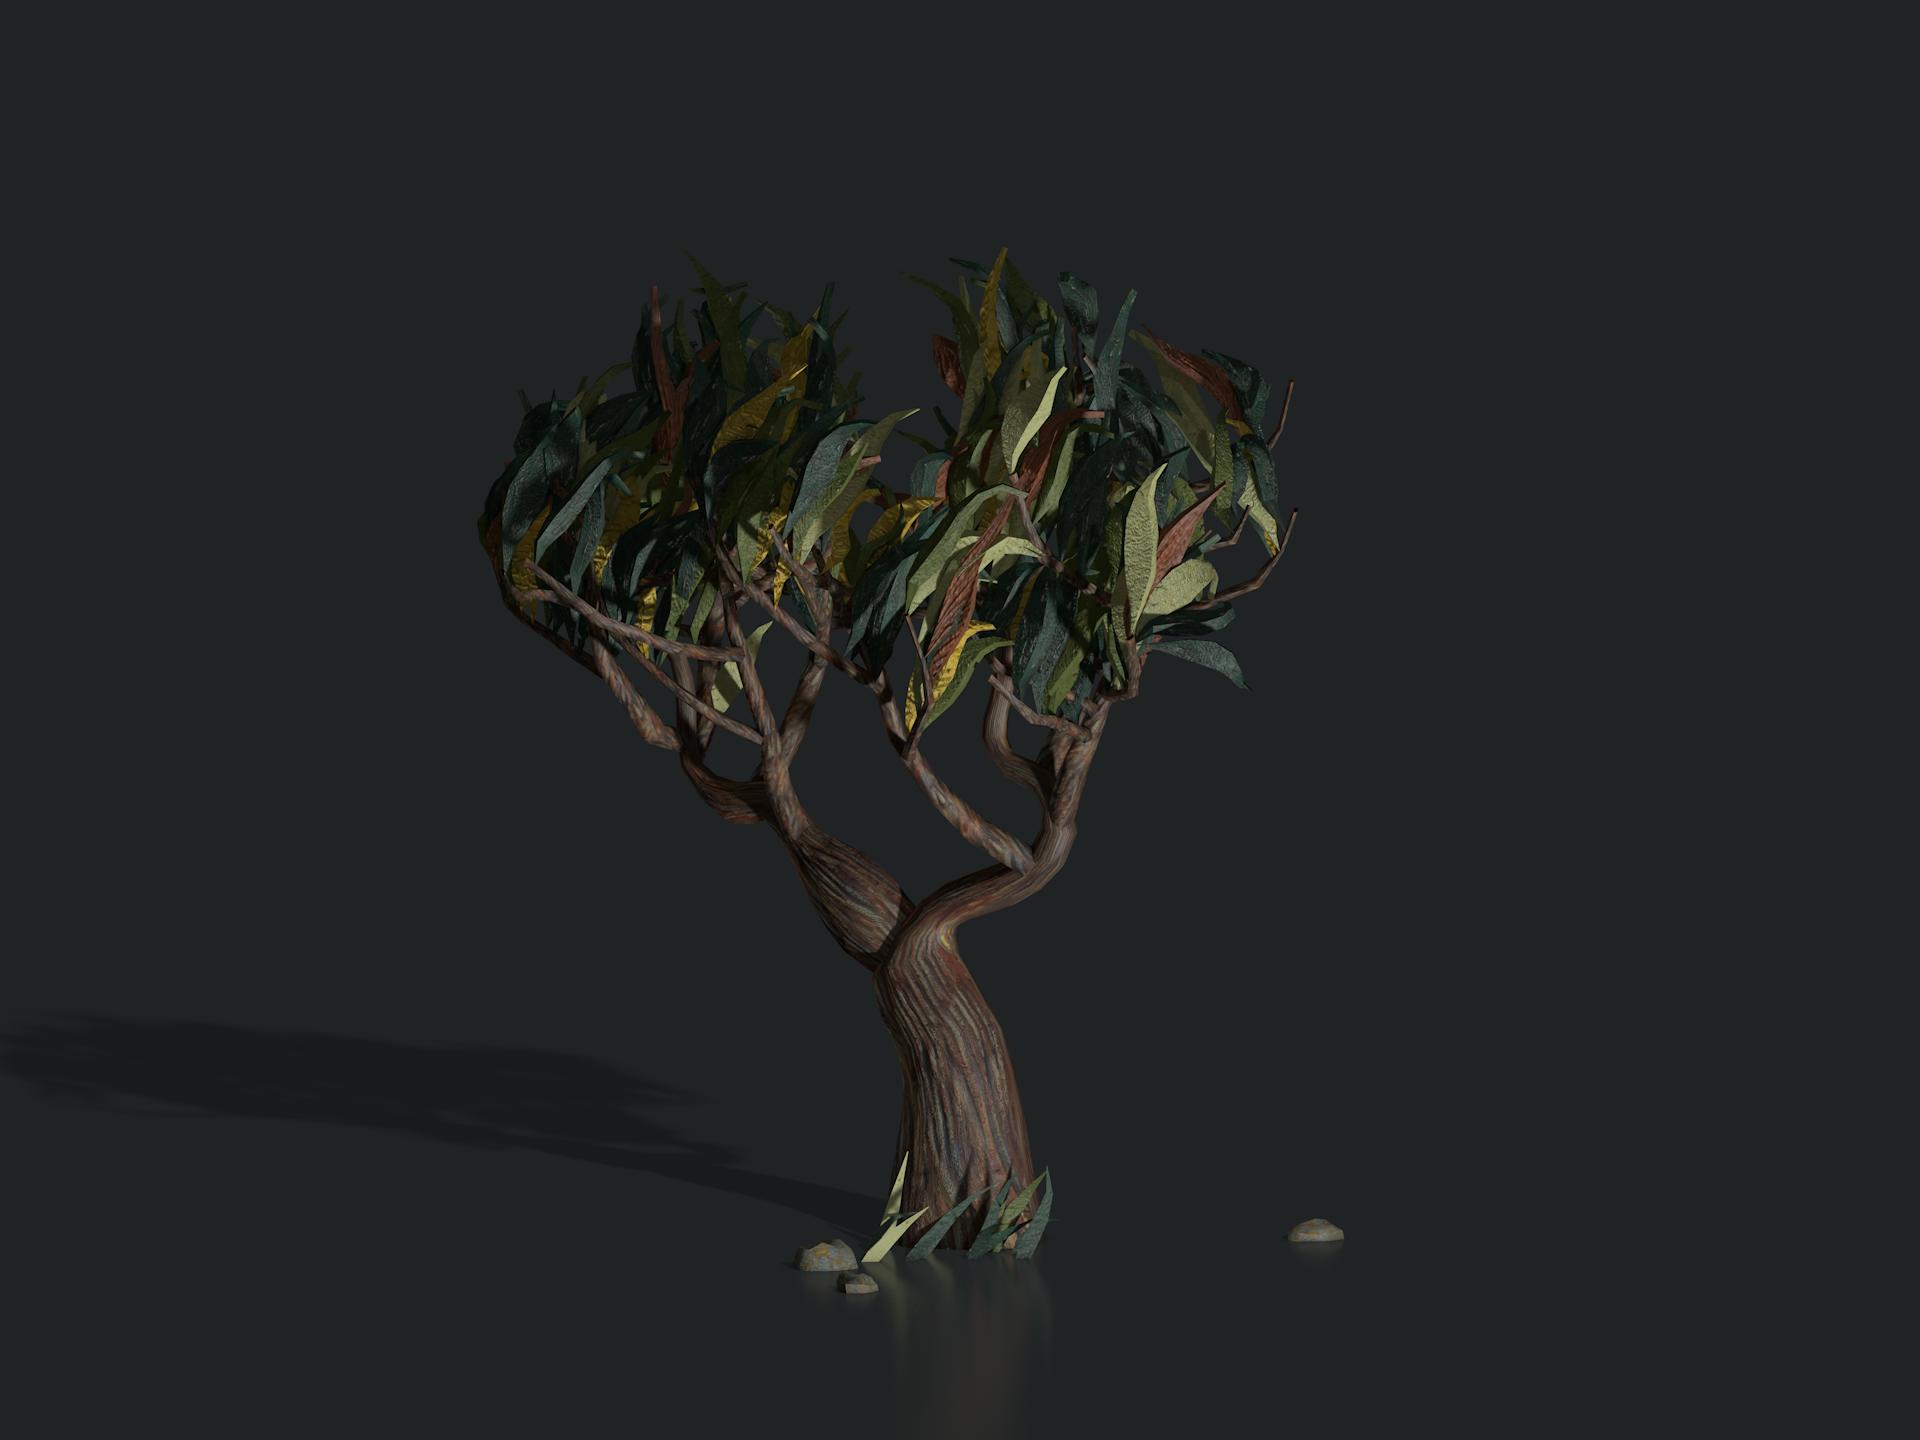 plants_saint_remy_tree1304.png